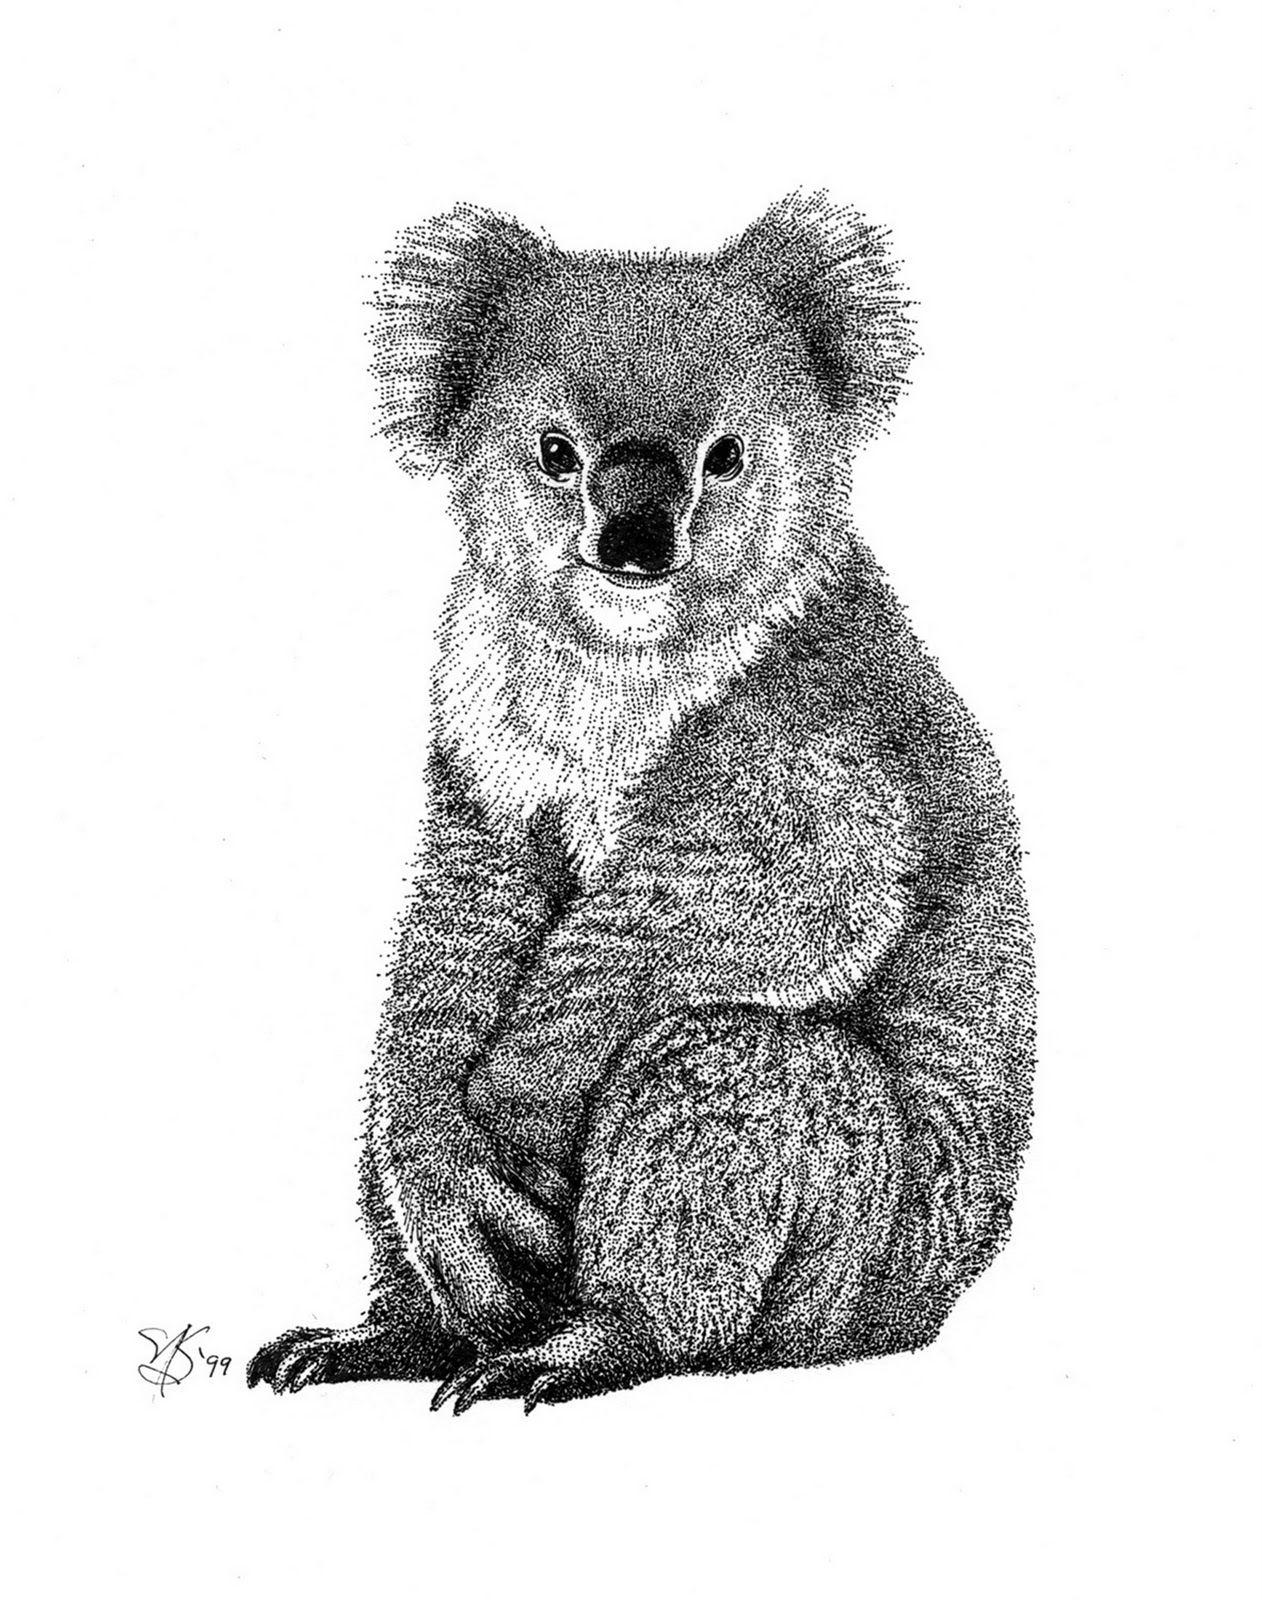 Pin By Kim Gatto On Koala In 2019 Pinterest